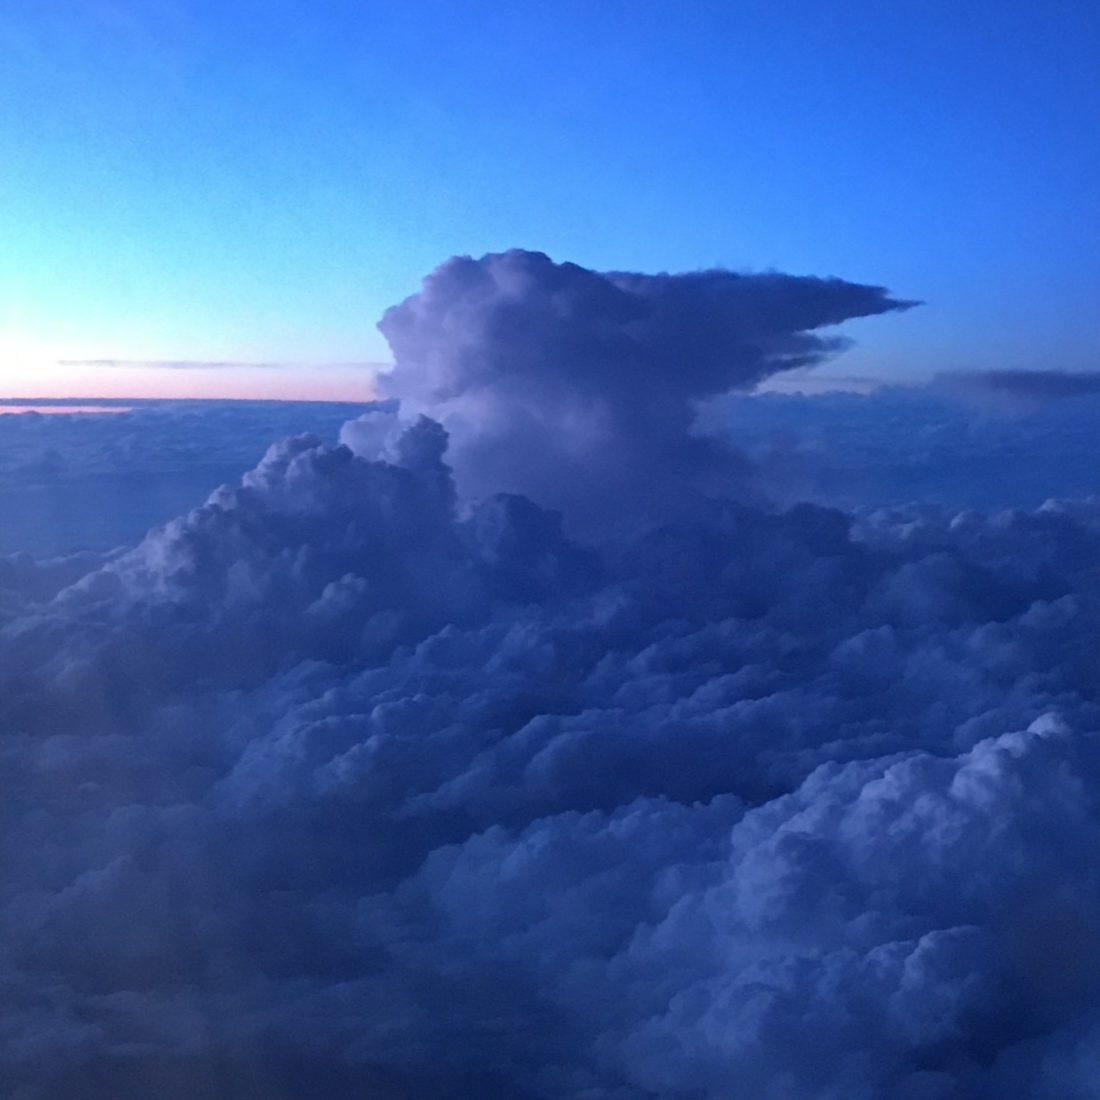 Cumulonimbus © Michael lo